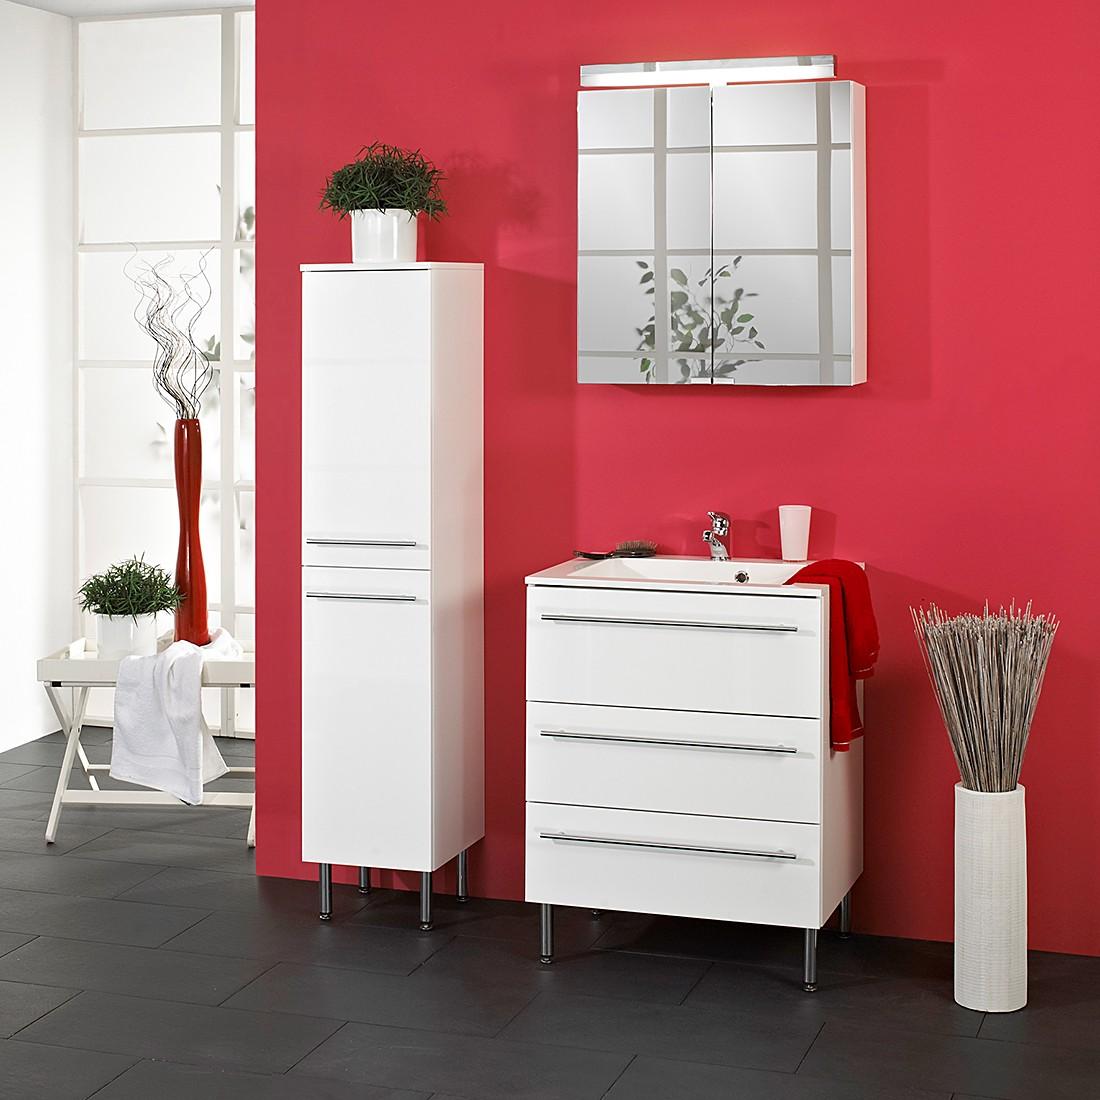 Home 24 - Meuble lavabo bern ii - blanc, schildmeyer